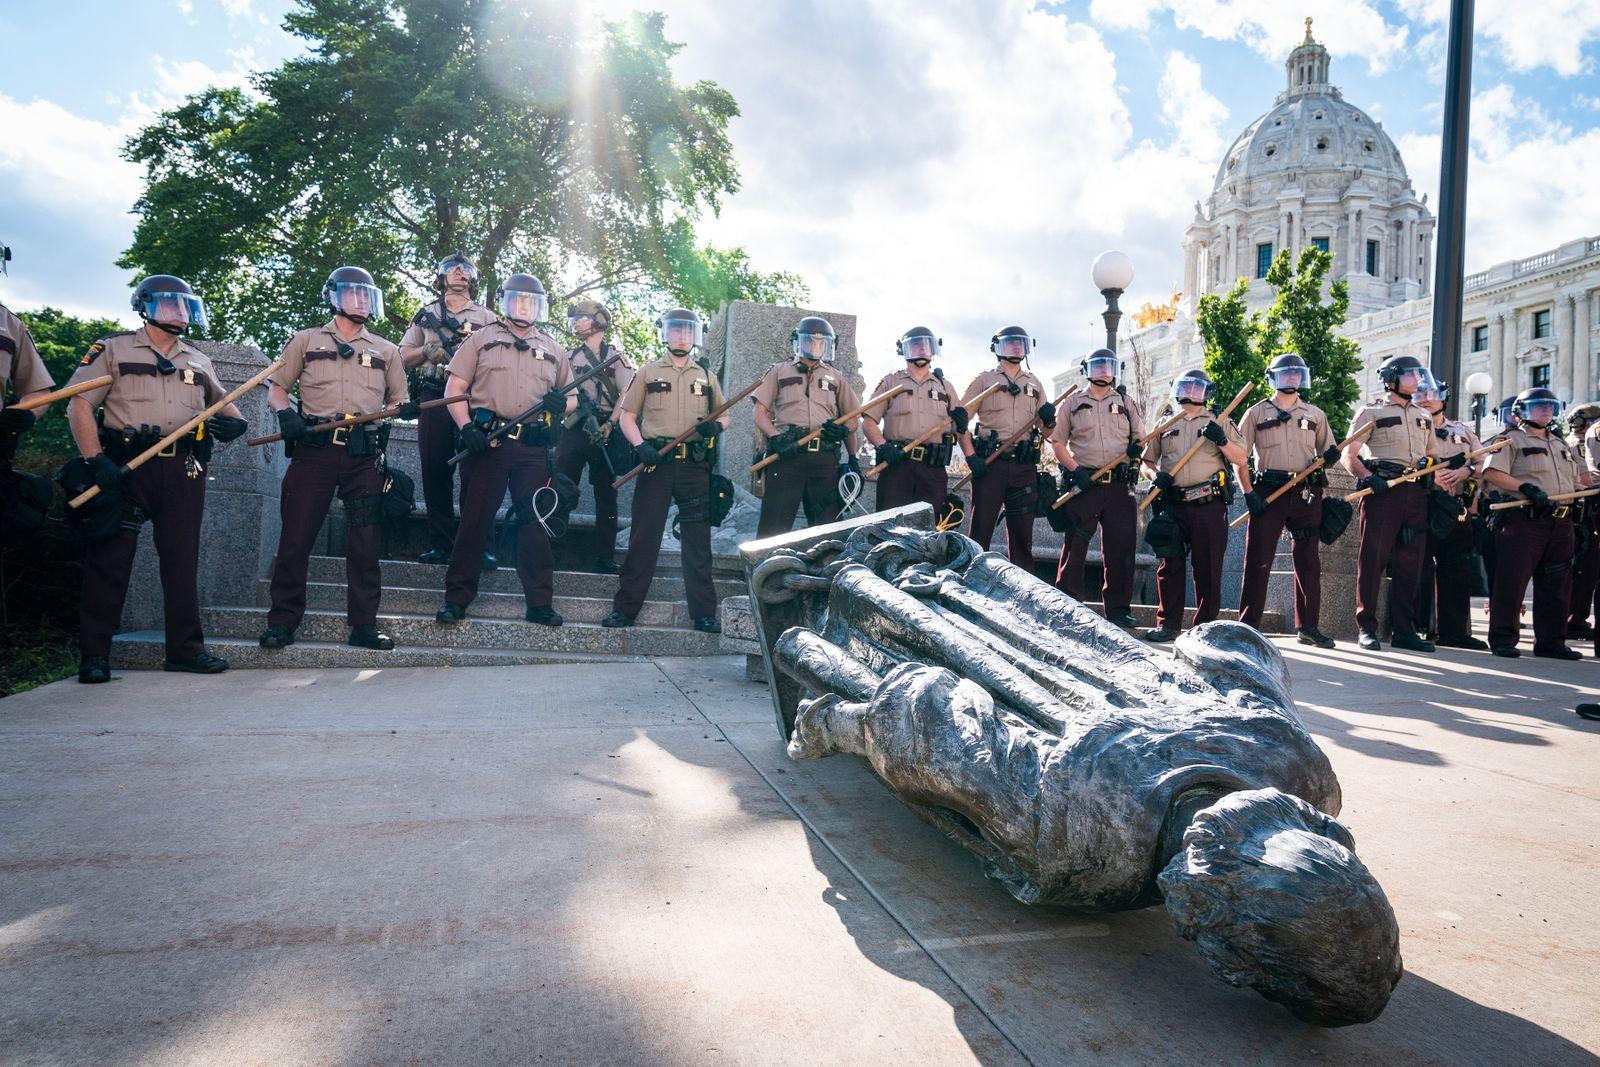 Columbus Statue toppled at Minnesota capitol